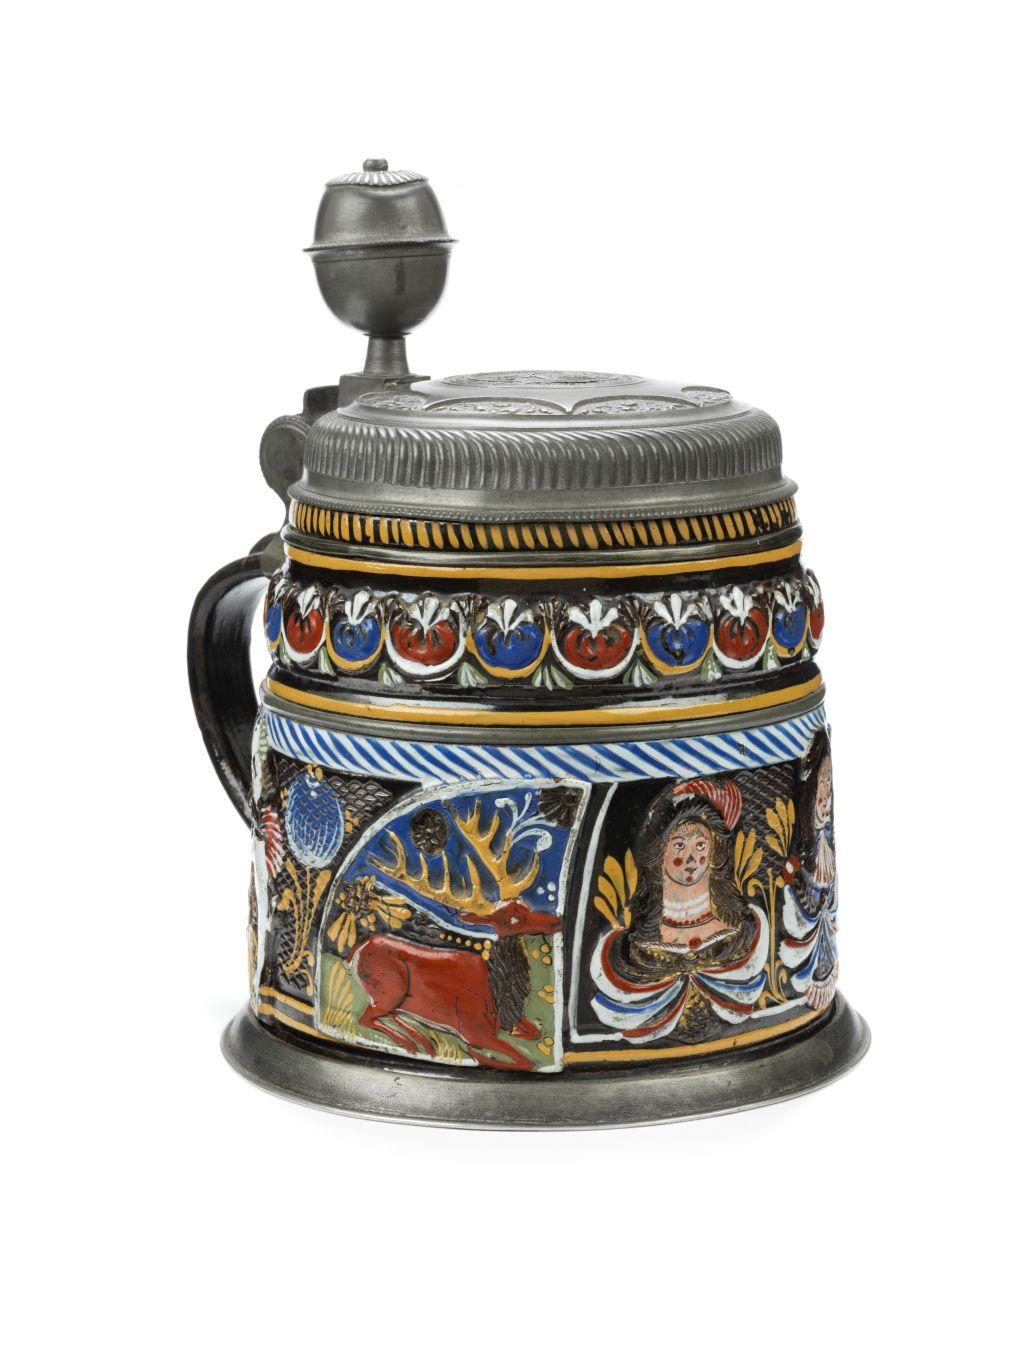 17th century Annaberg Dippoldiswalde Saltglazed Stoneware Tankard ca. 1680